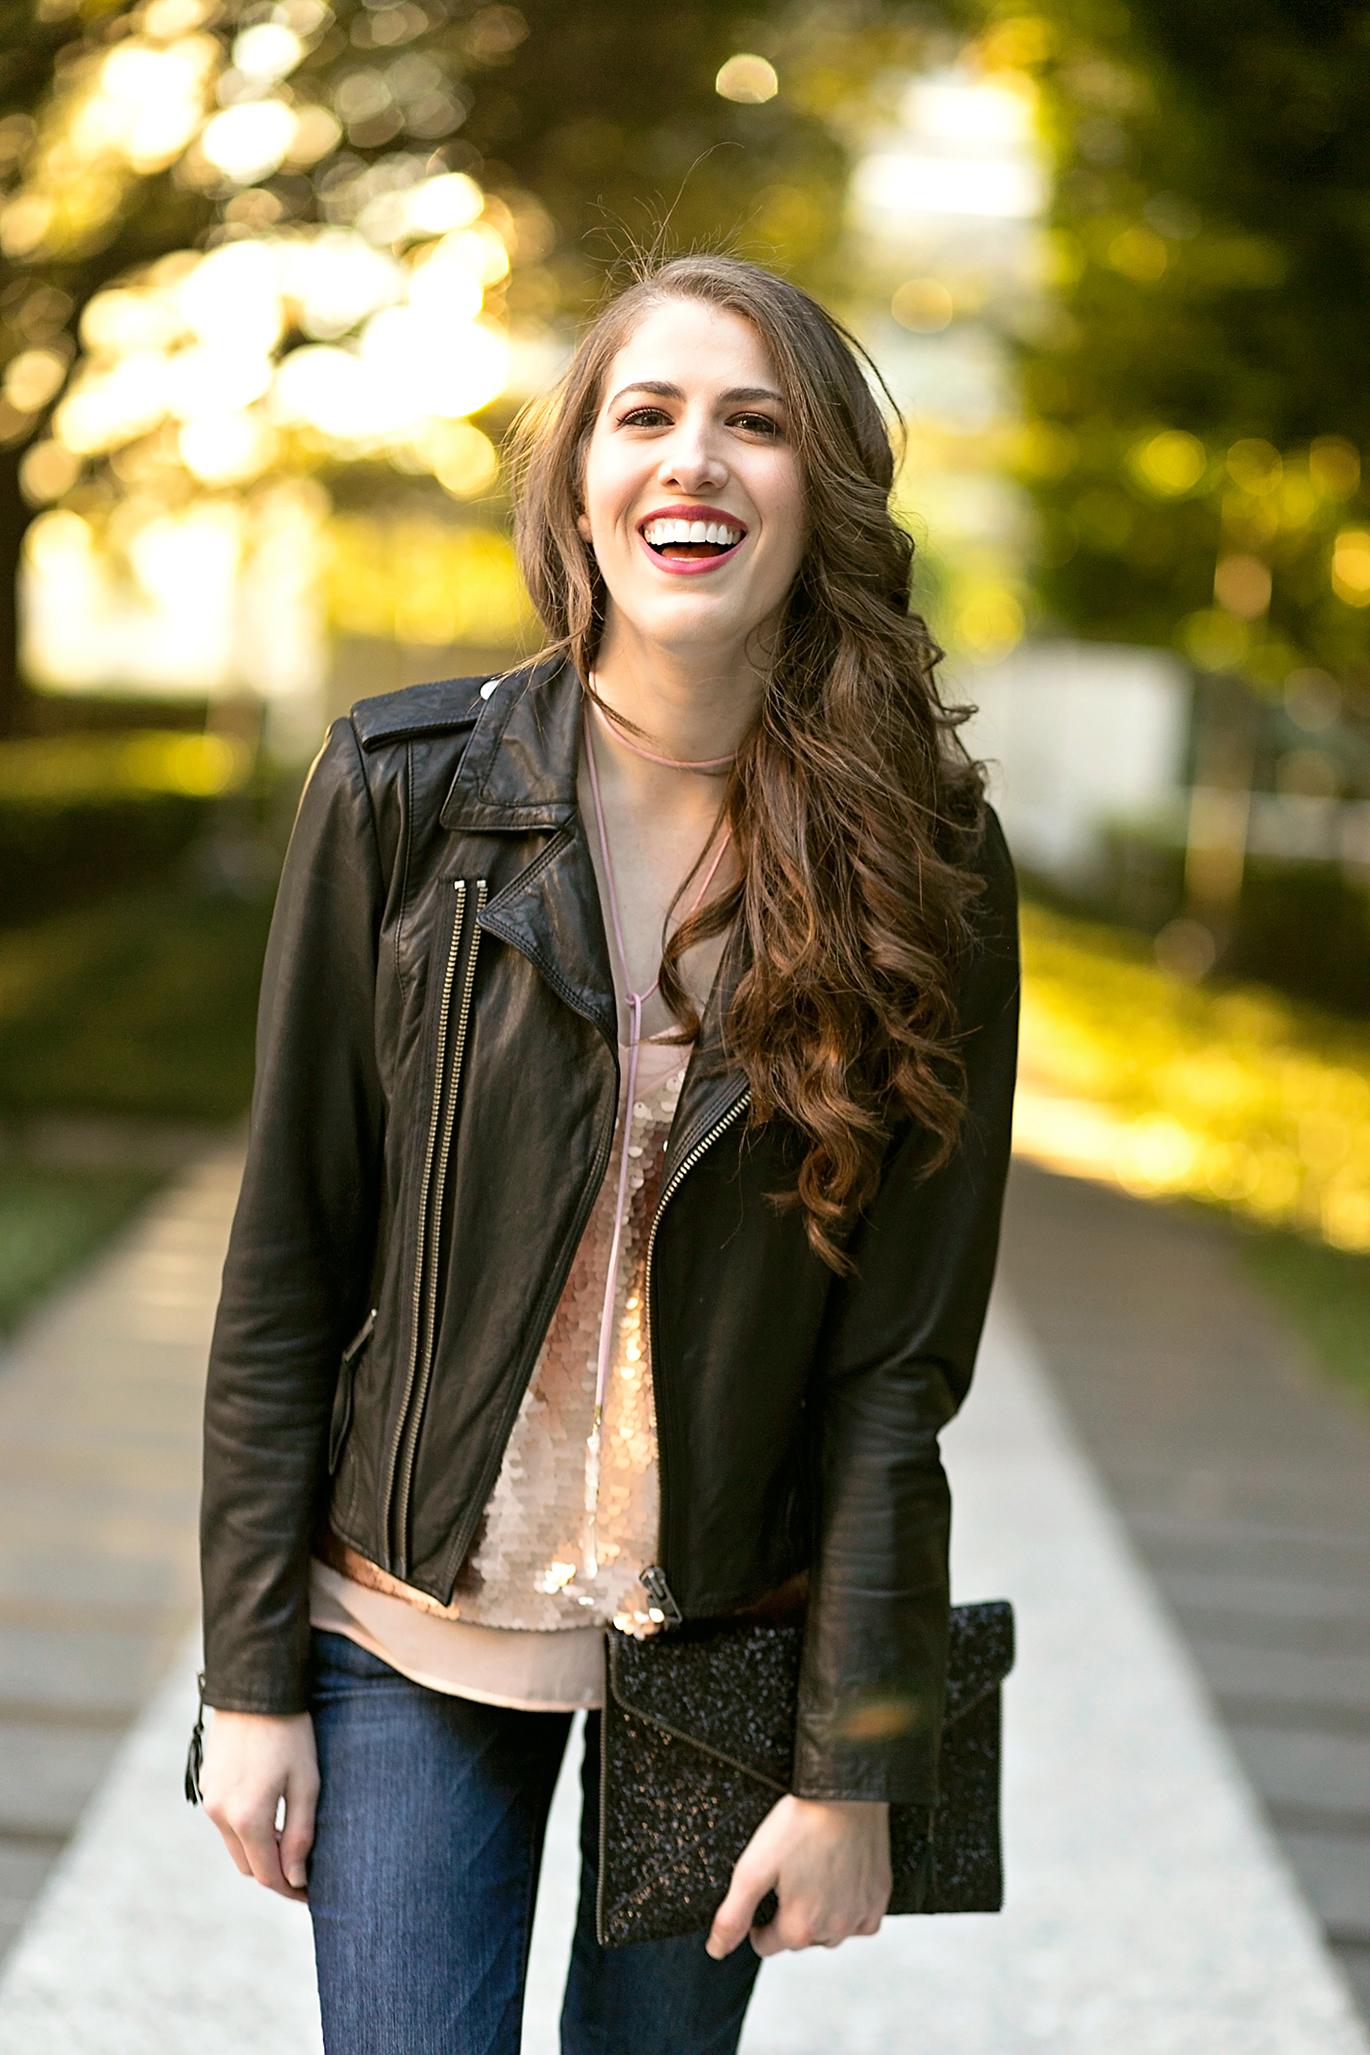 Joie black leather jacket